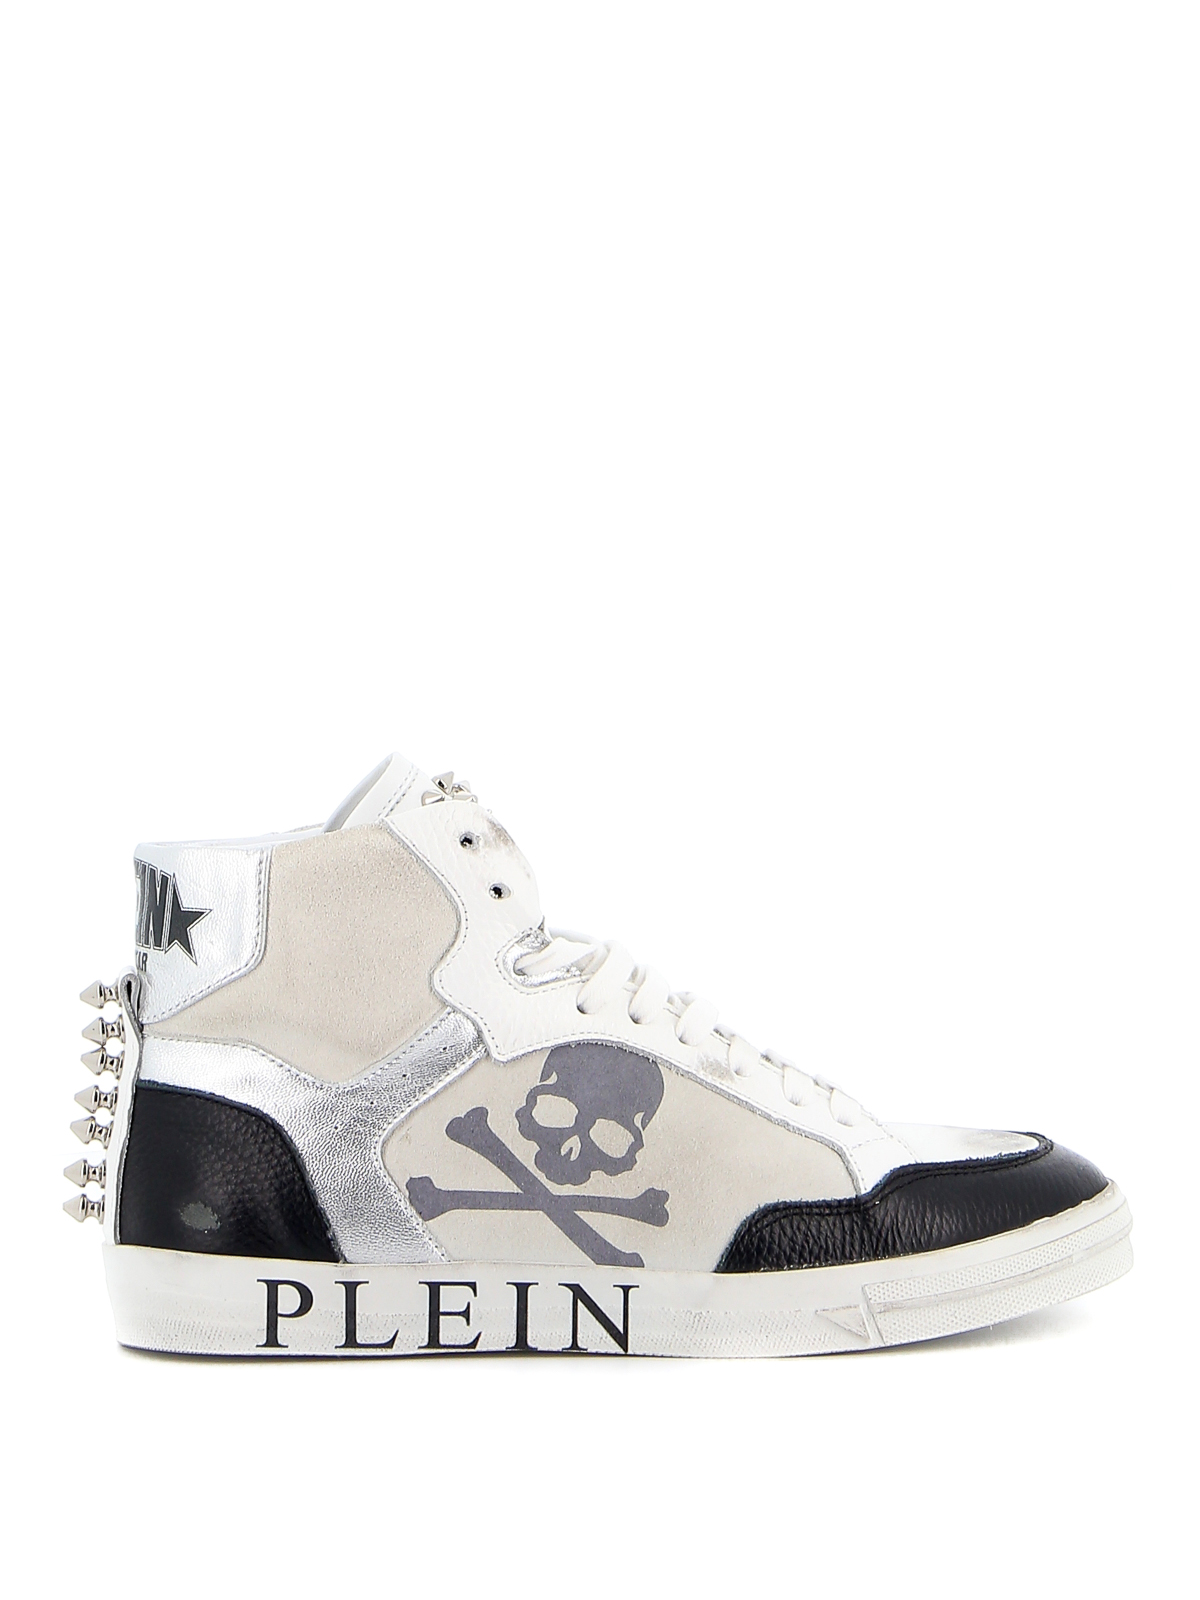 Philipp Plein STAR HI-TOP SNEAKERS